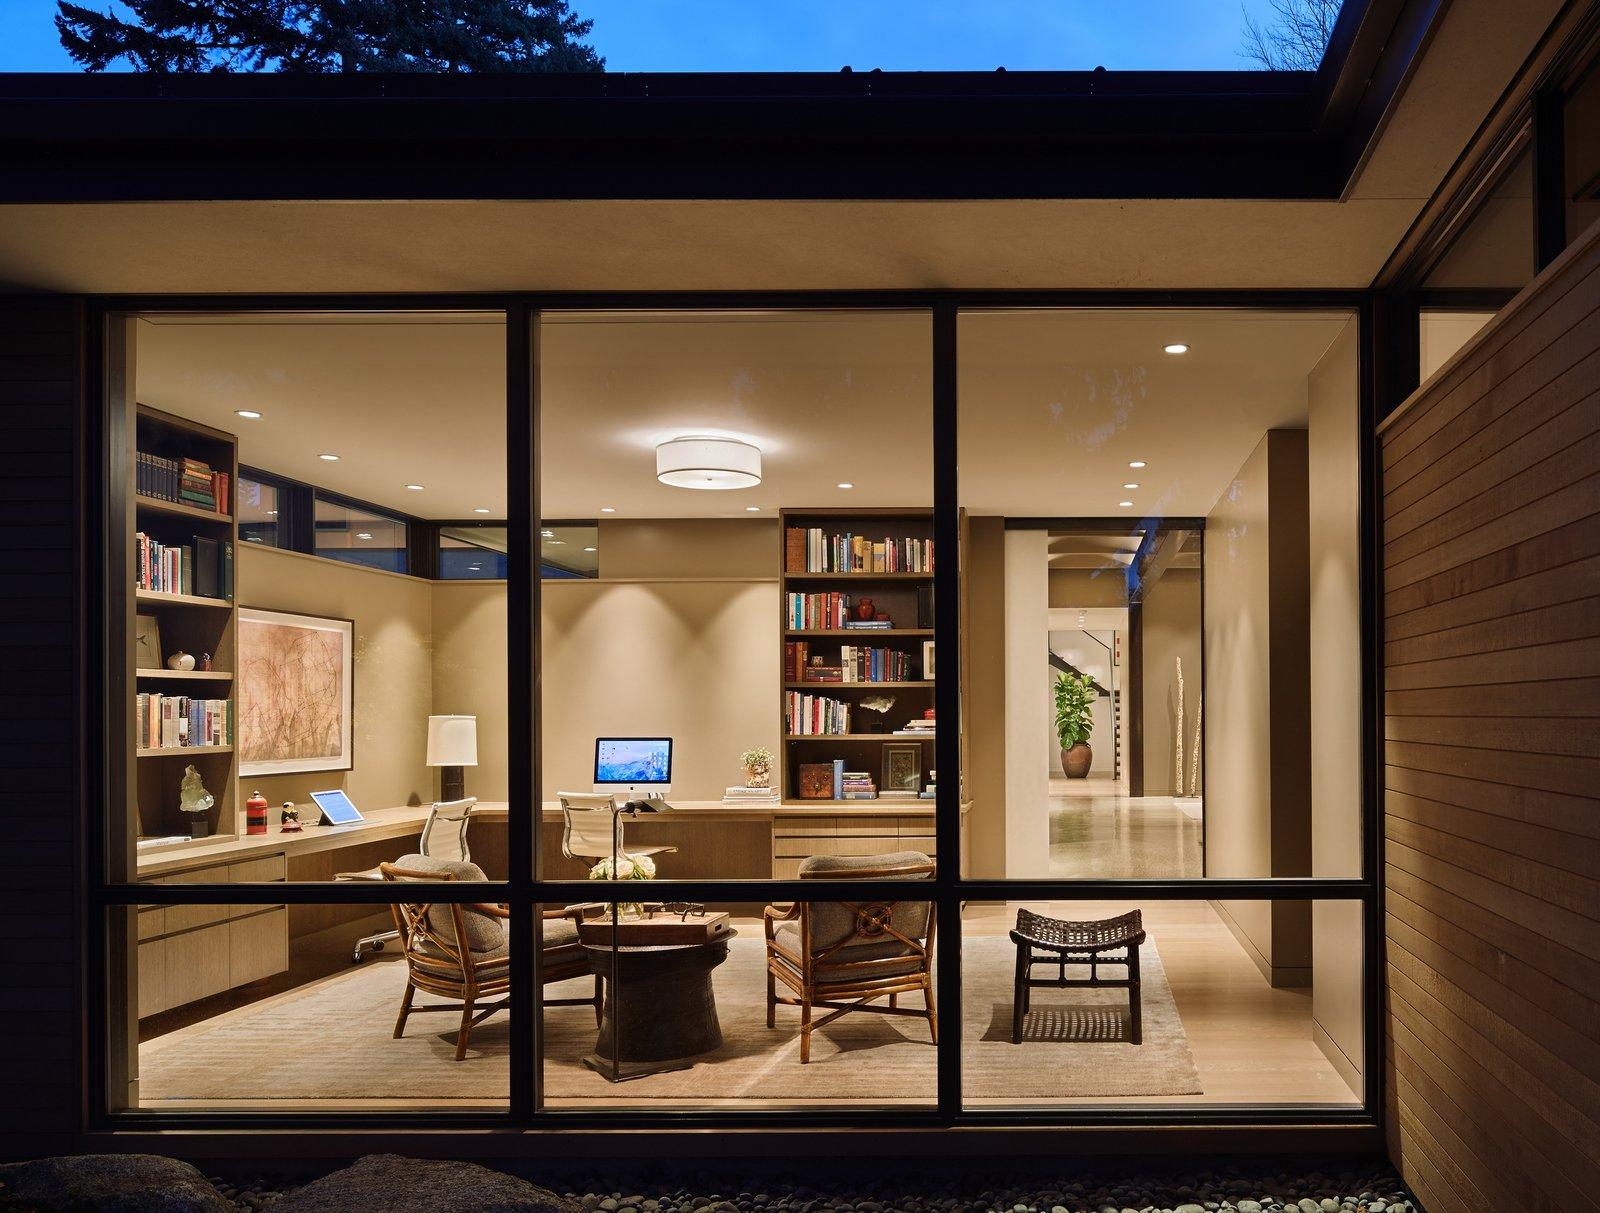 Office, Study Room Type, Chair, Desk, and Medium Hardwood Floor Den  Best Photos from Union Bay Residence